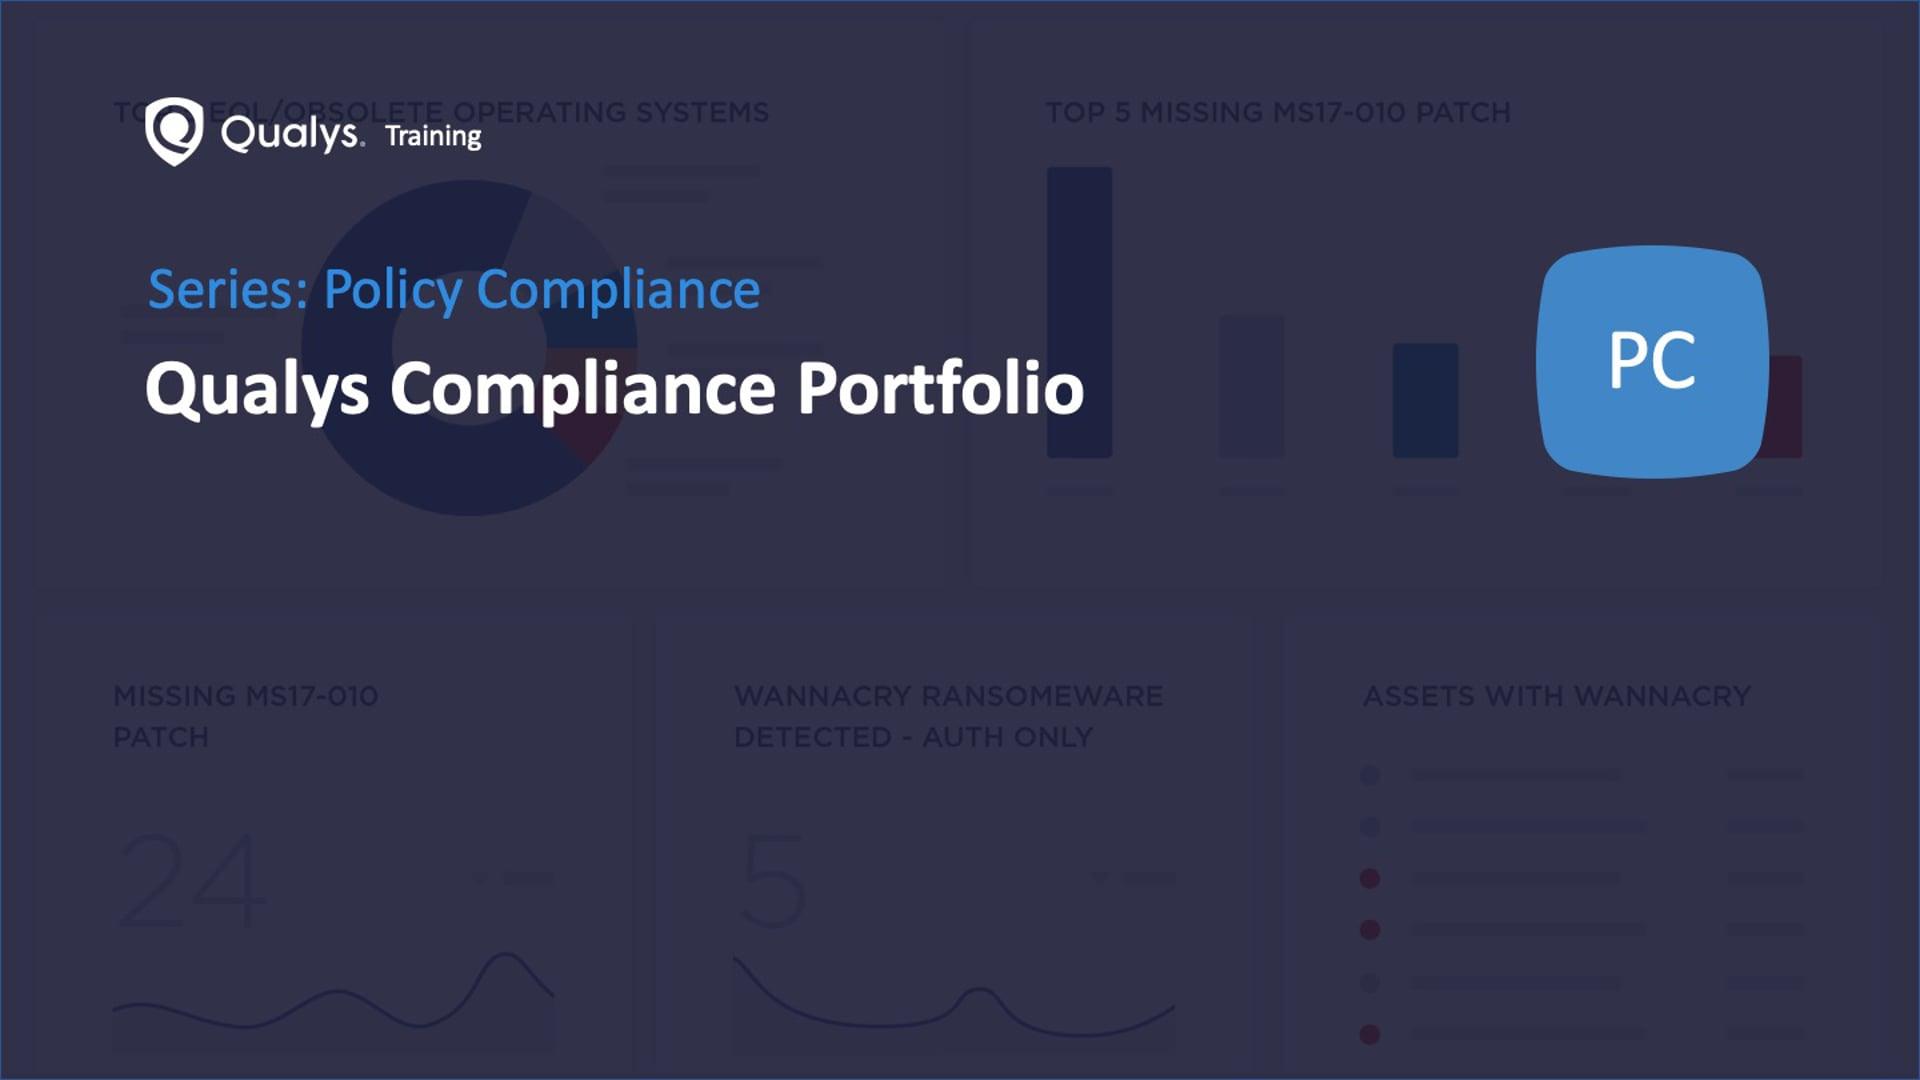 Qualys Compliance Portfolio